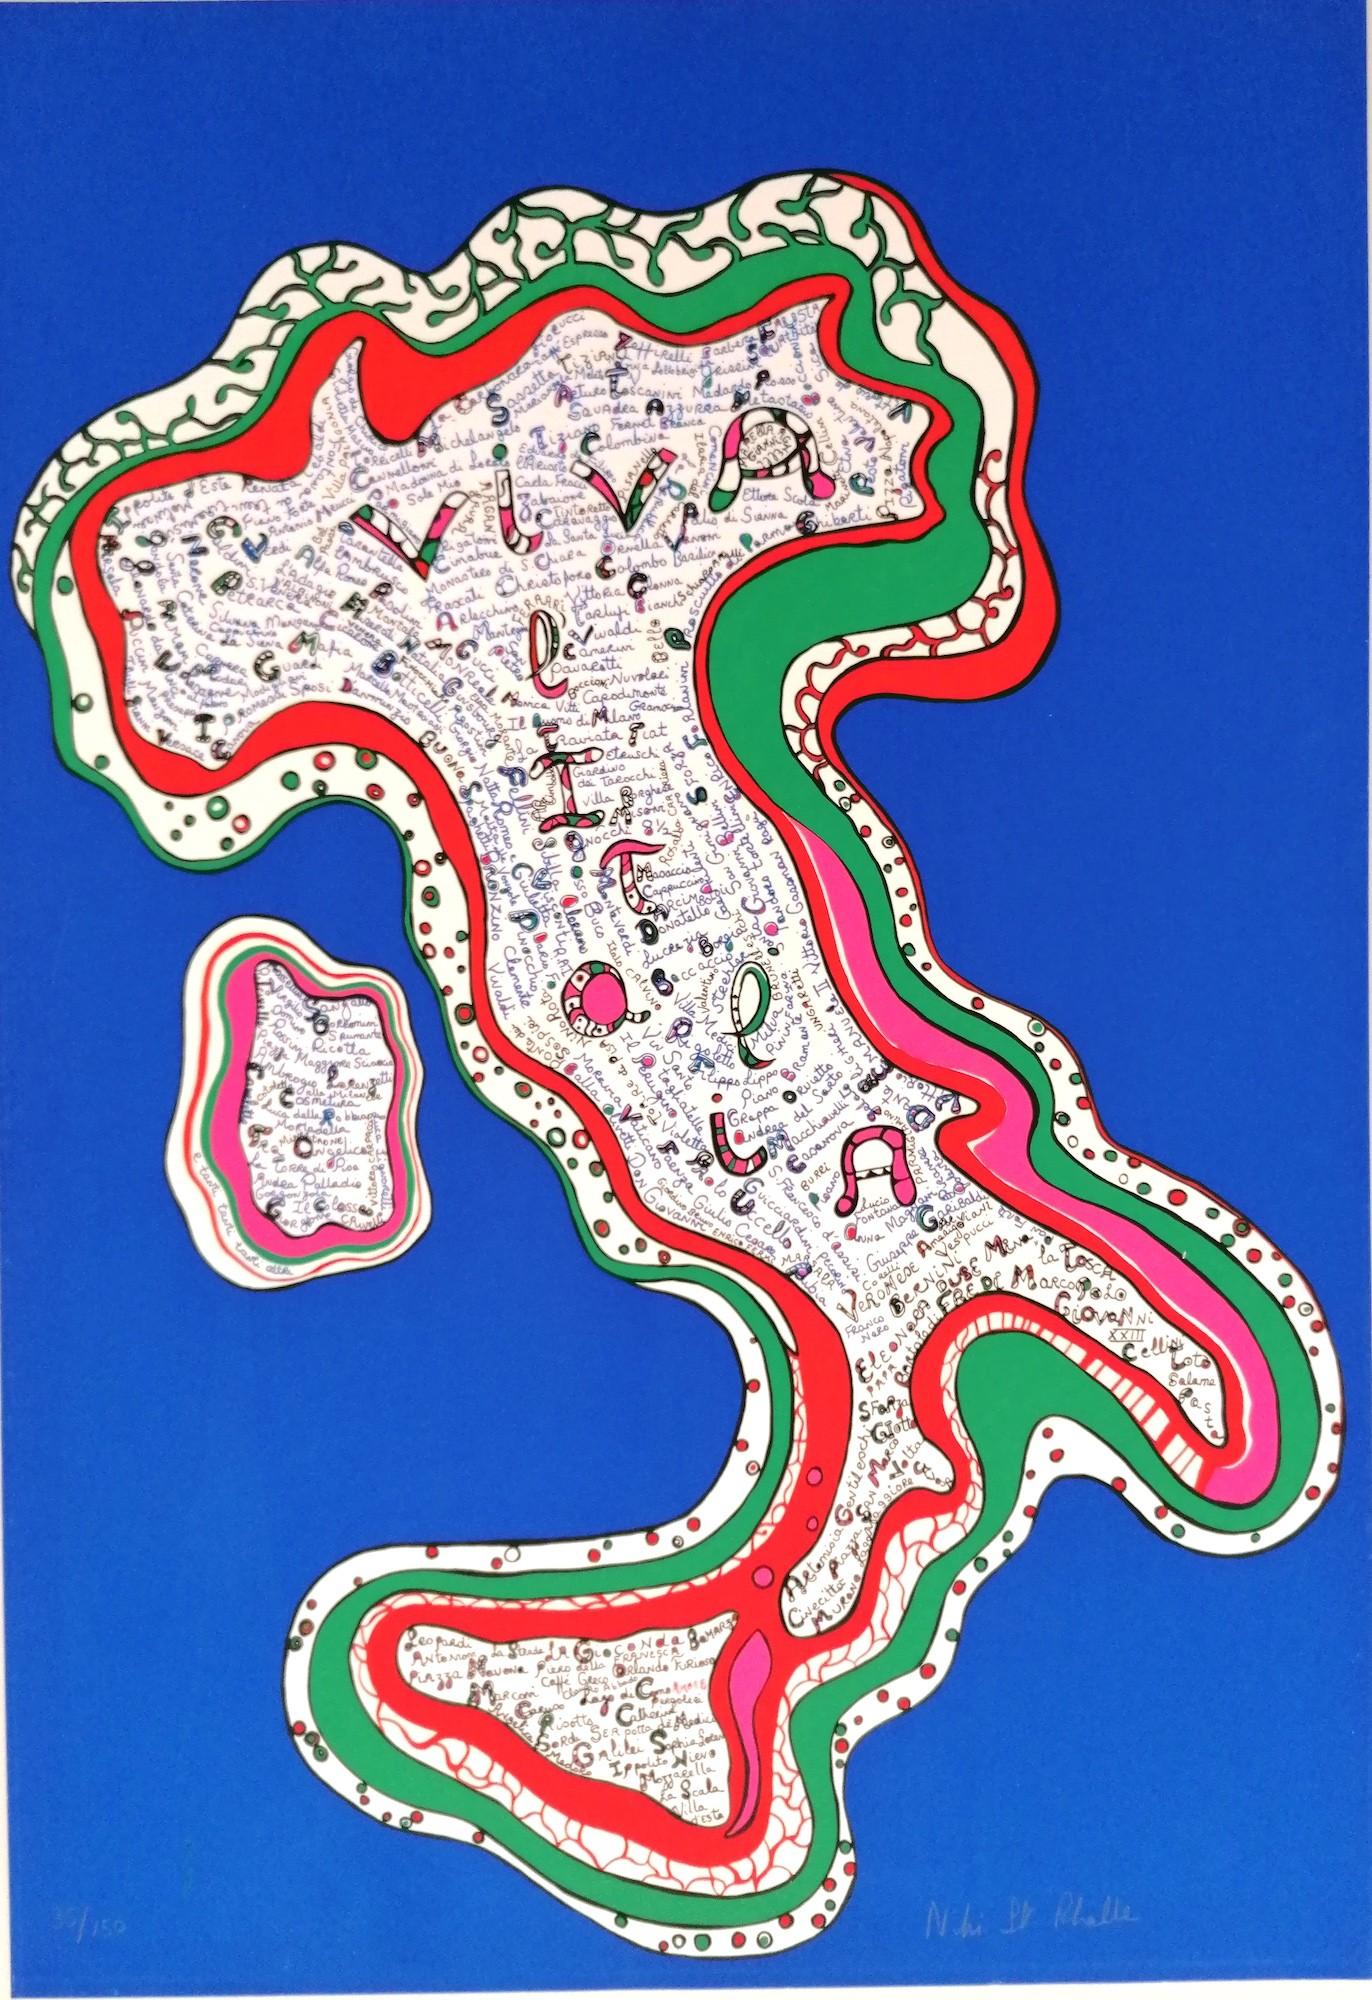 de Saint Phalle, Nikki, Kunst, Galerie Voigt, Nürnberg